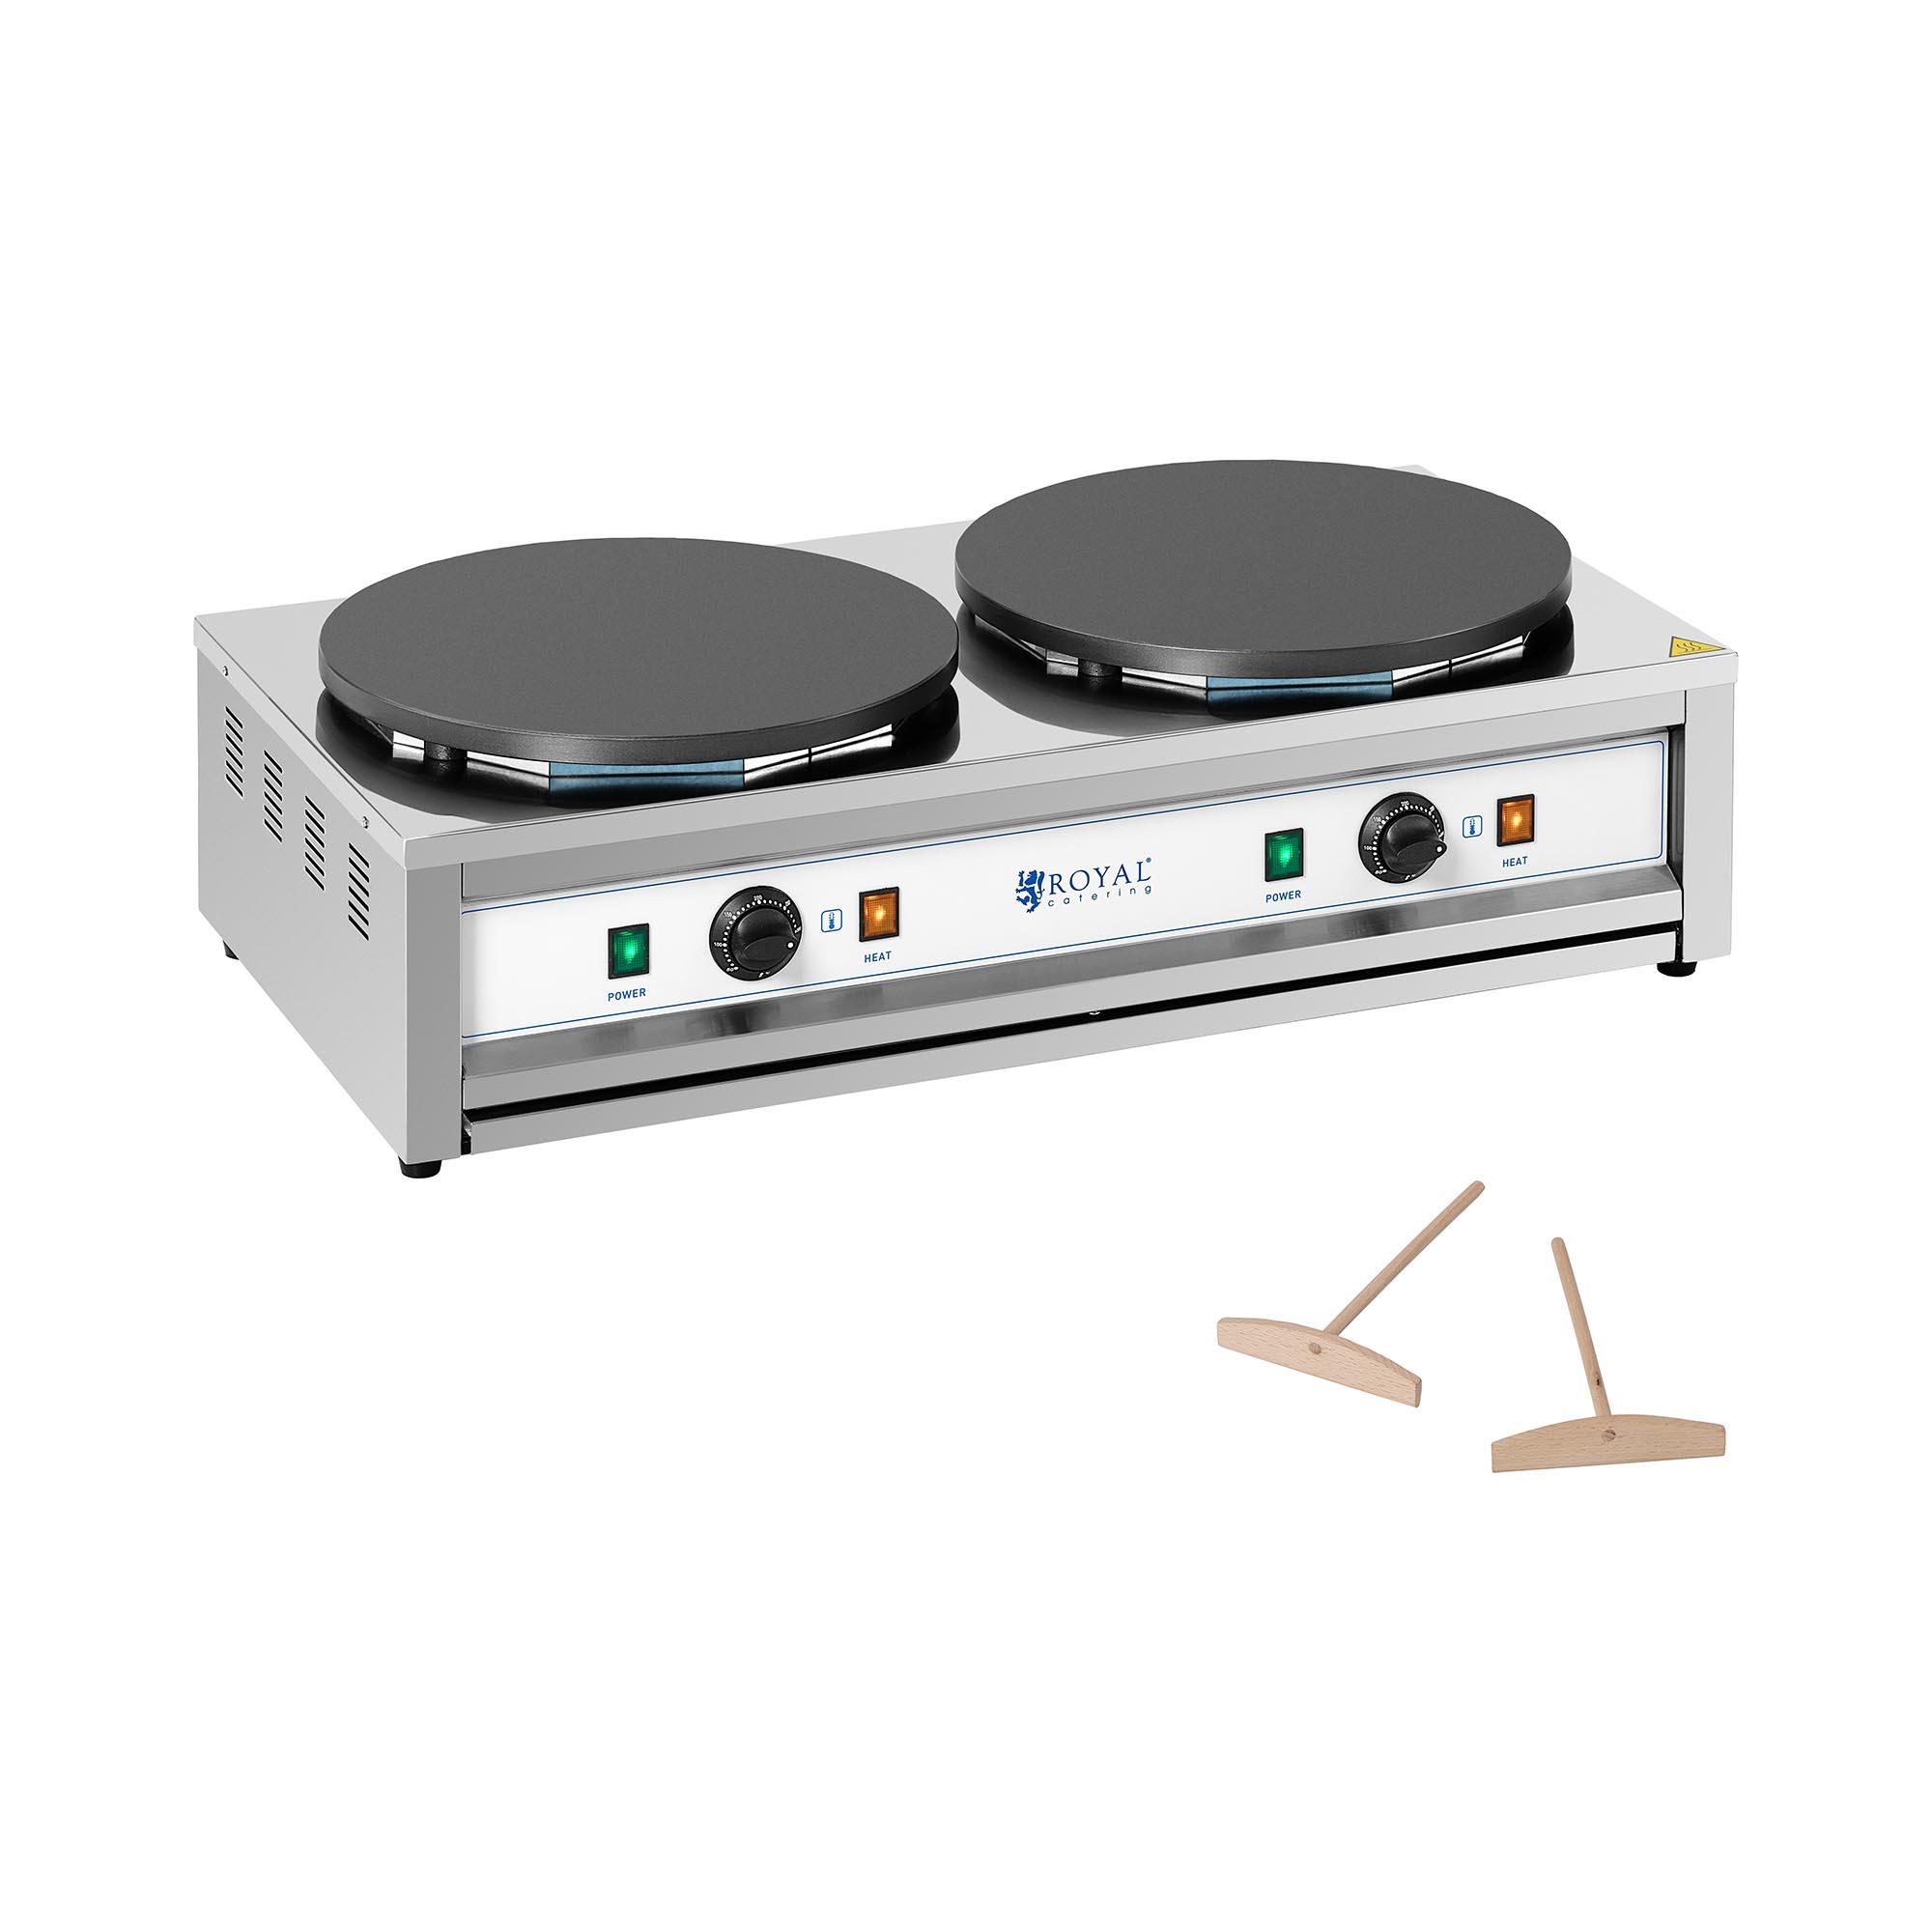 Royal Catering Crêpesmaker - 2 Heizplatten - 2 x 400 mm - 2 x 3.000 W RC-CMD01